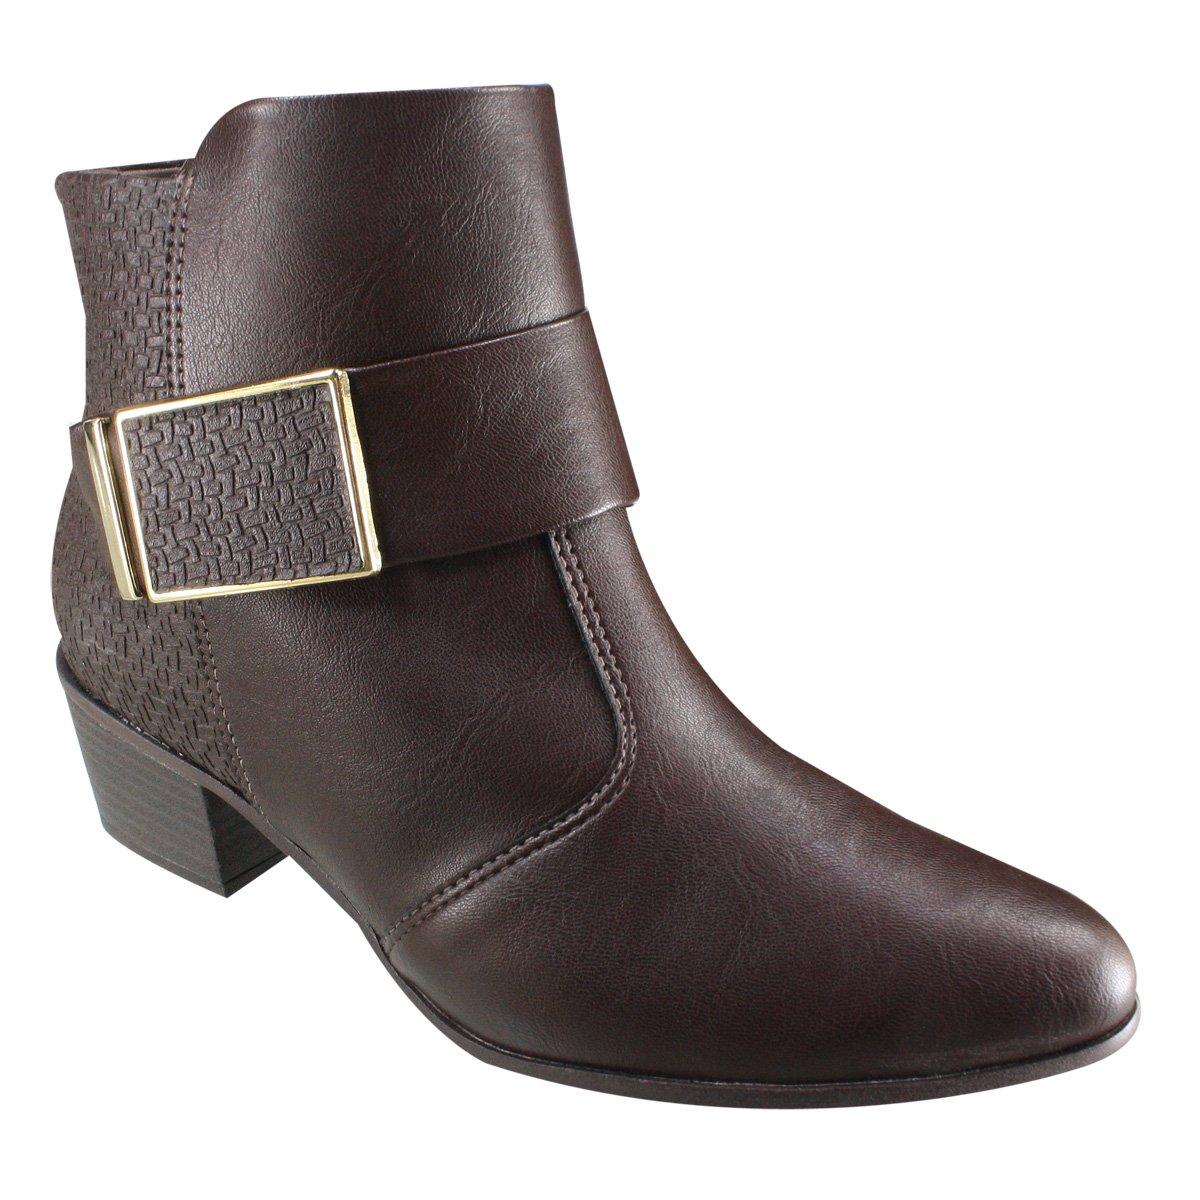 e9998c13e2 Bota Ankle Boot Ramarim Total Comfort 18-58101 000010 Brown (Naturale  Plus Trama